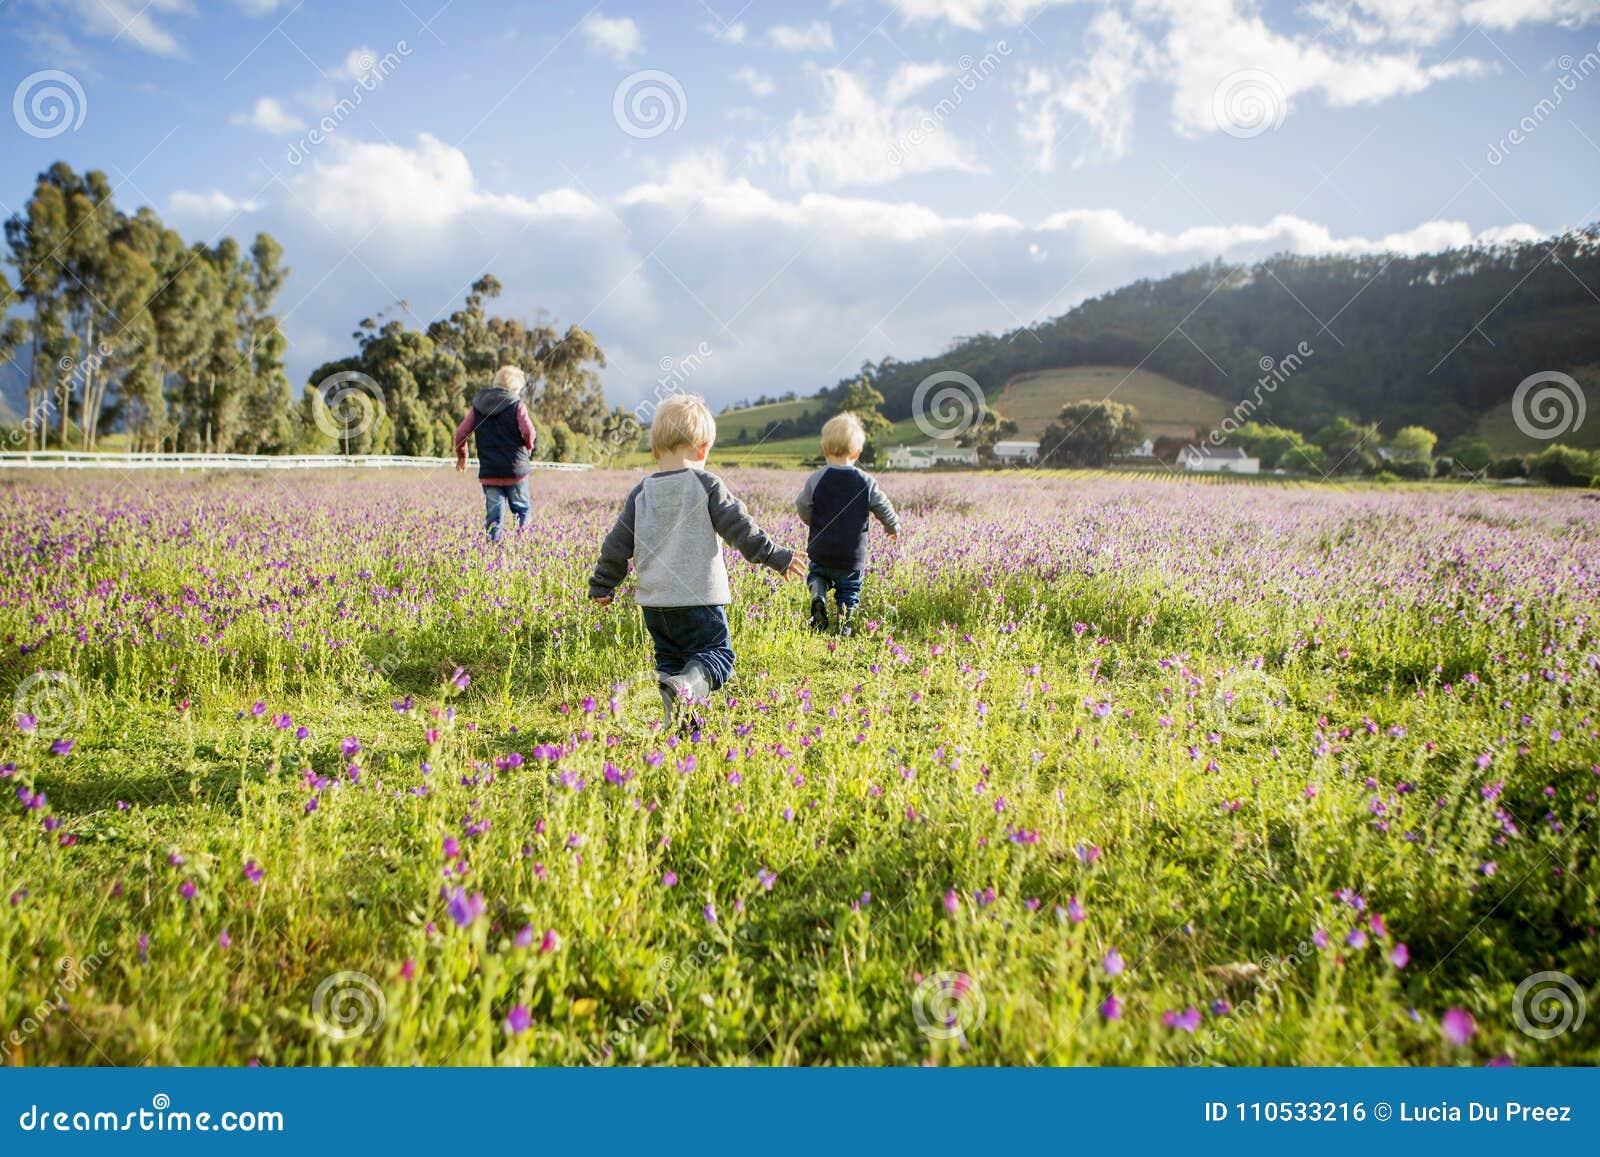 Three Children Run Through A Field Of Pink Flowers Stock Photo